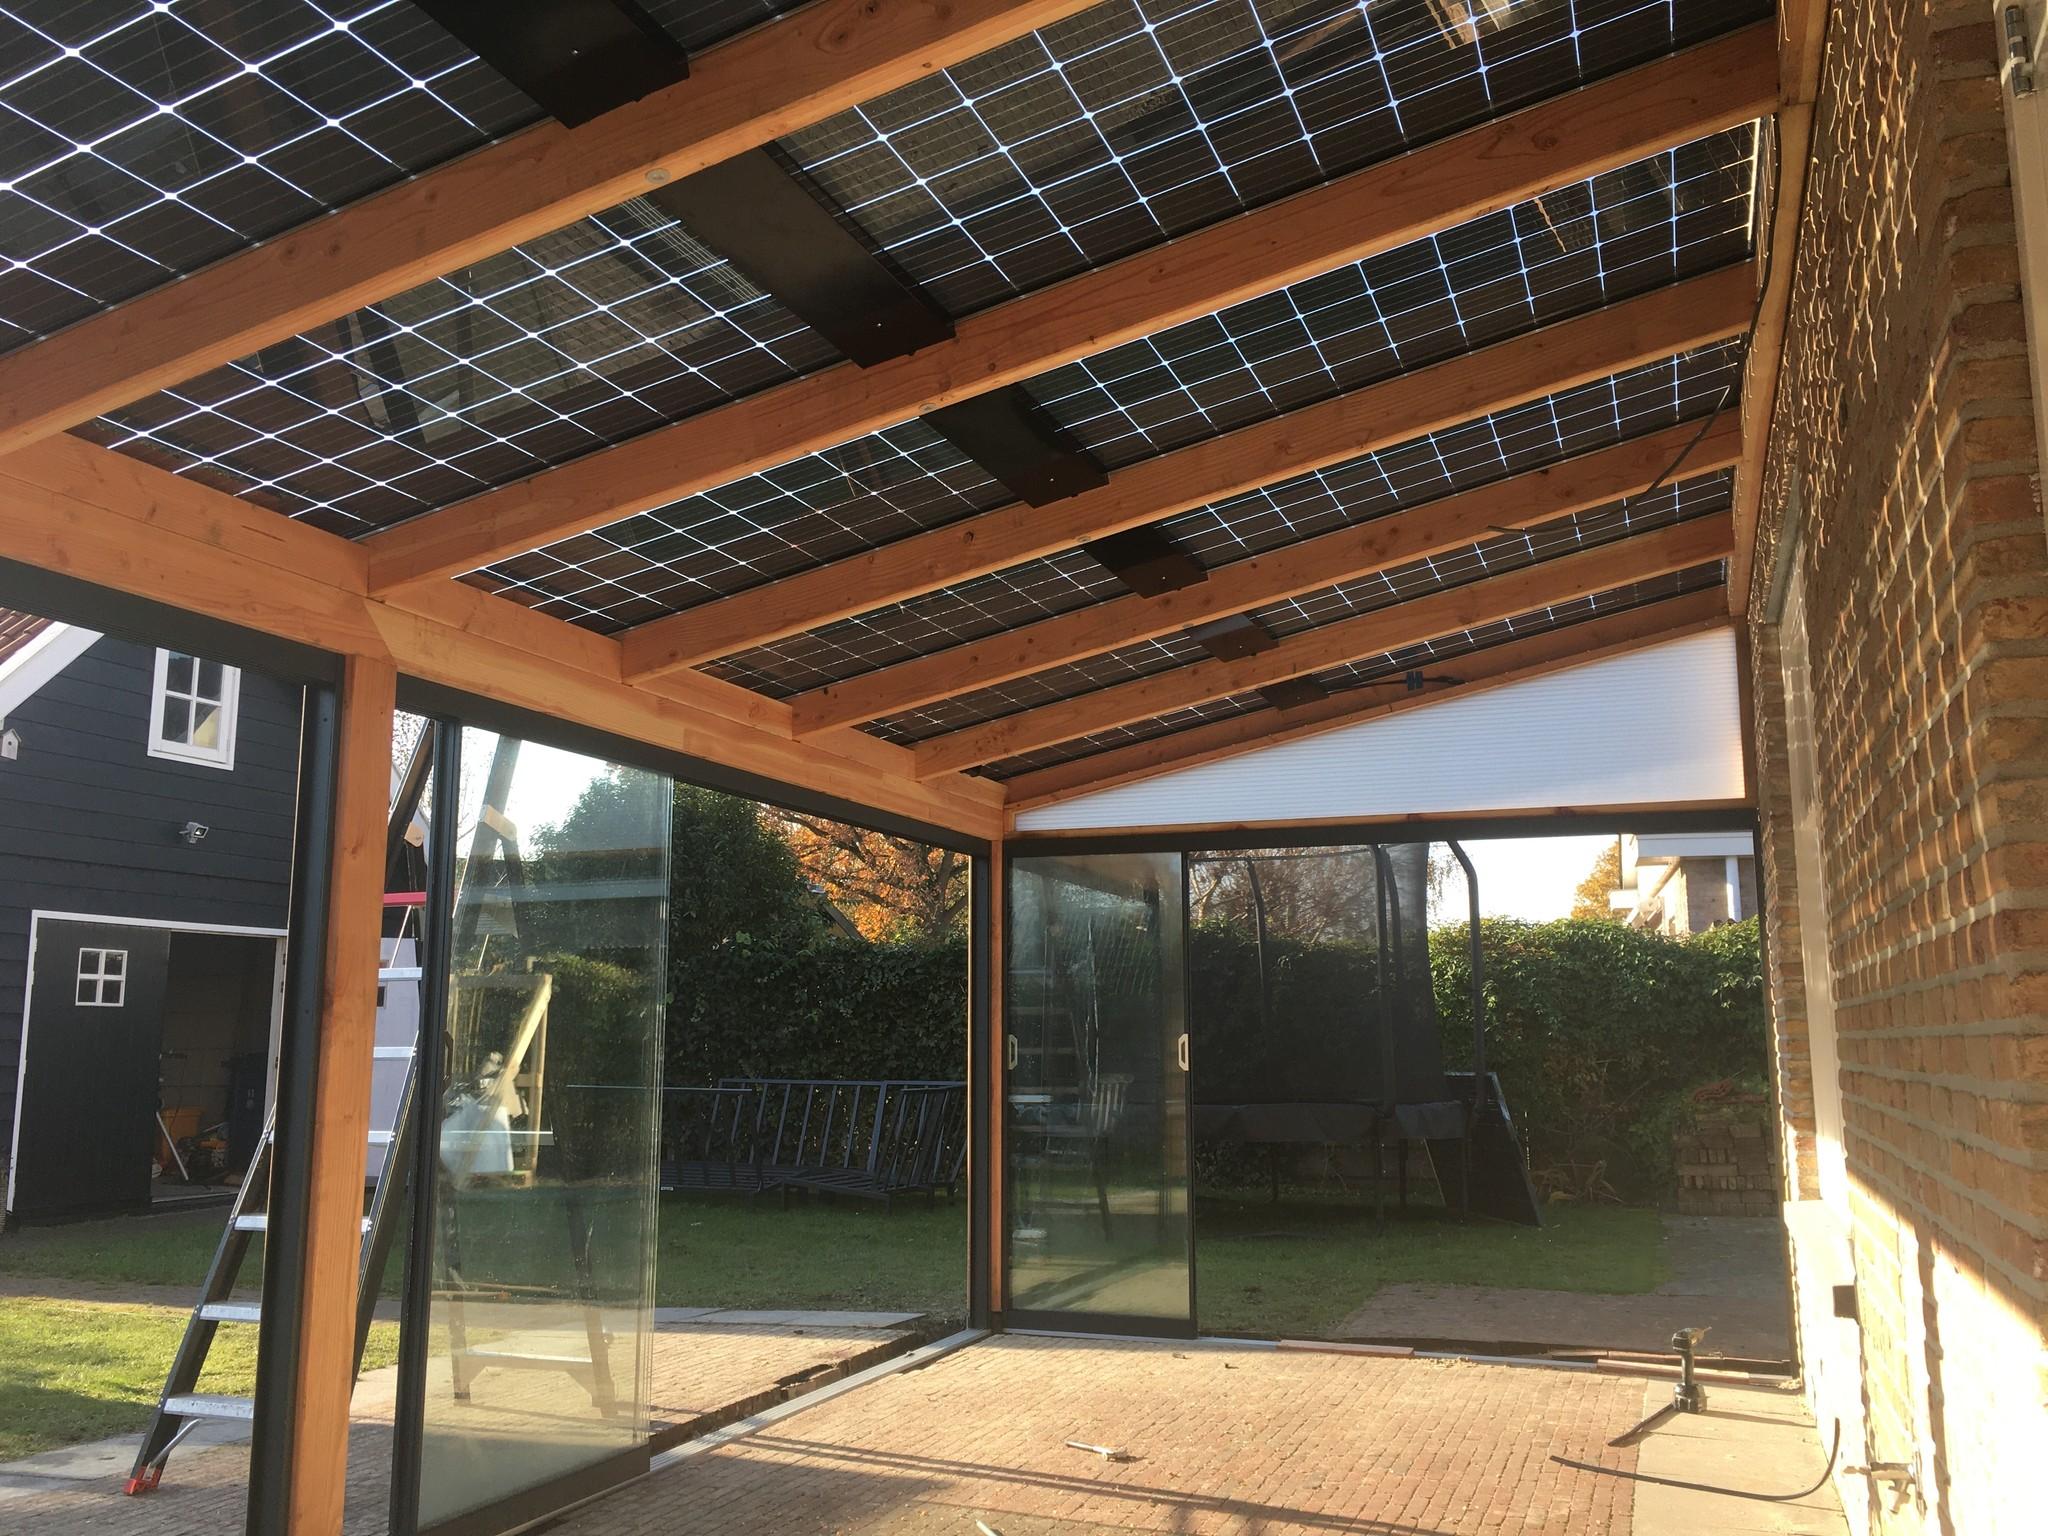 Solar Veranda muuraanbouw